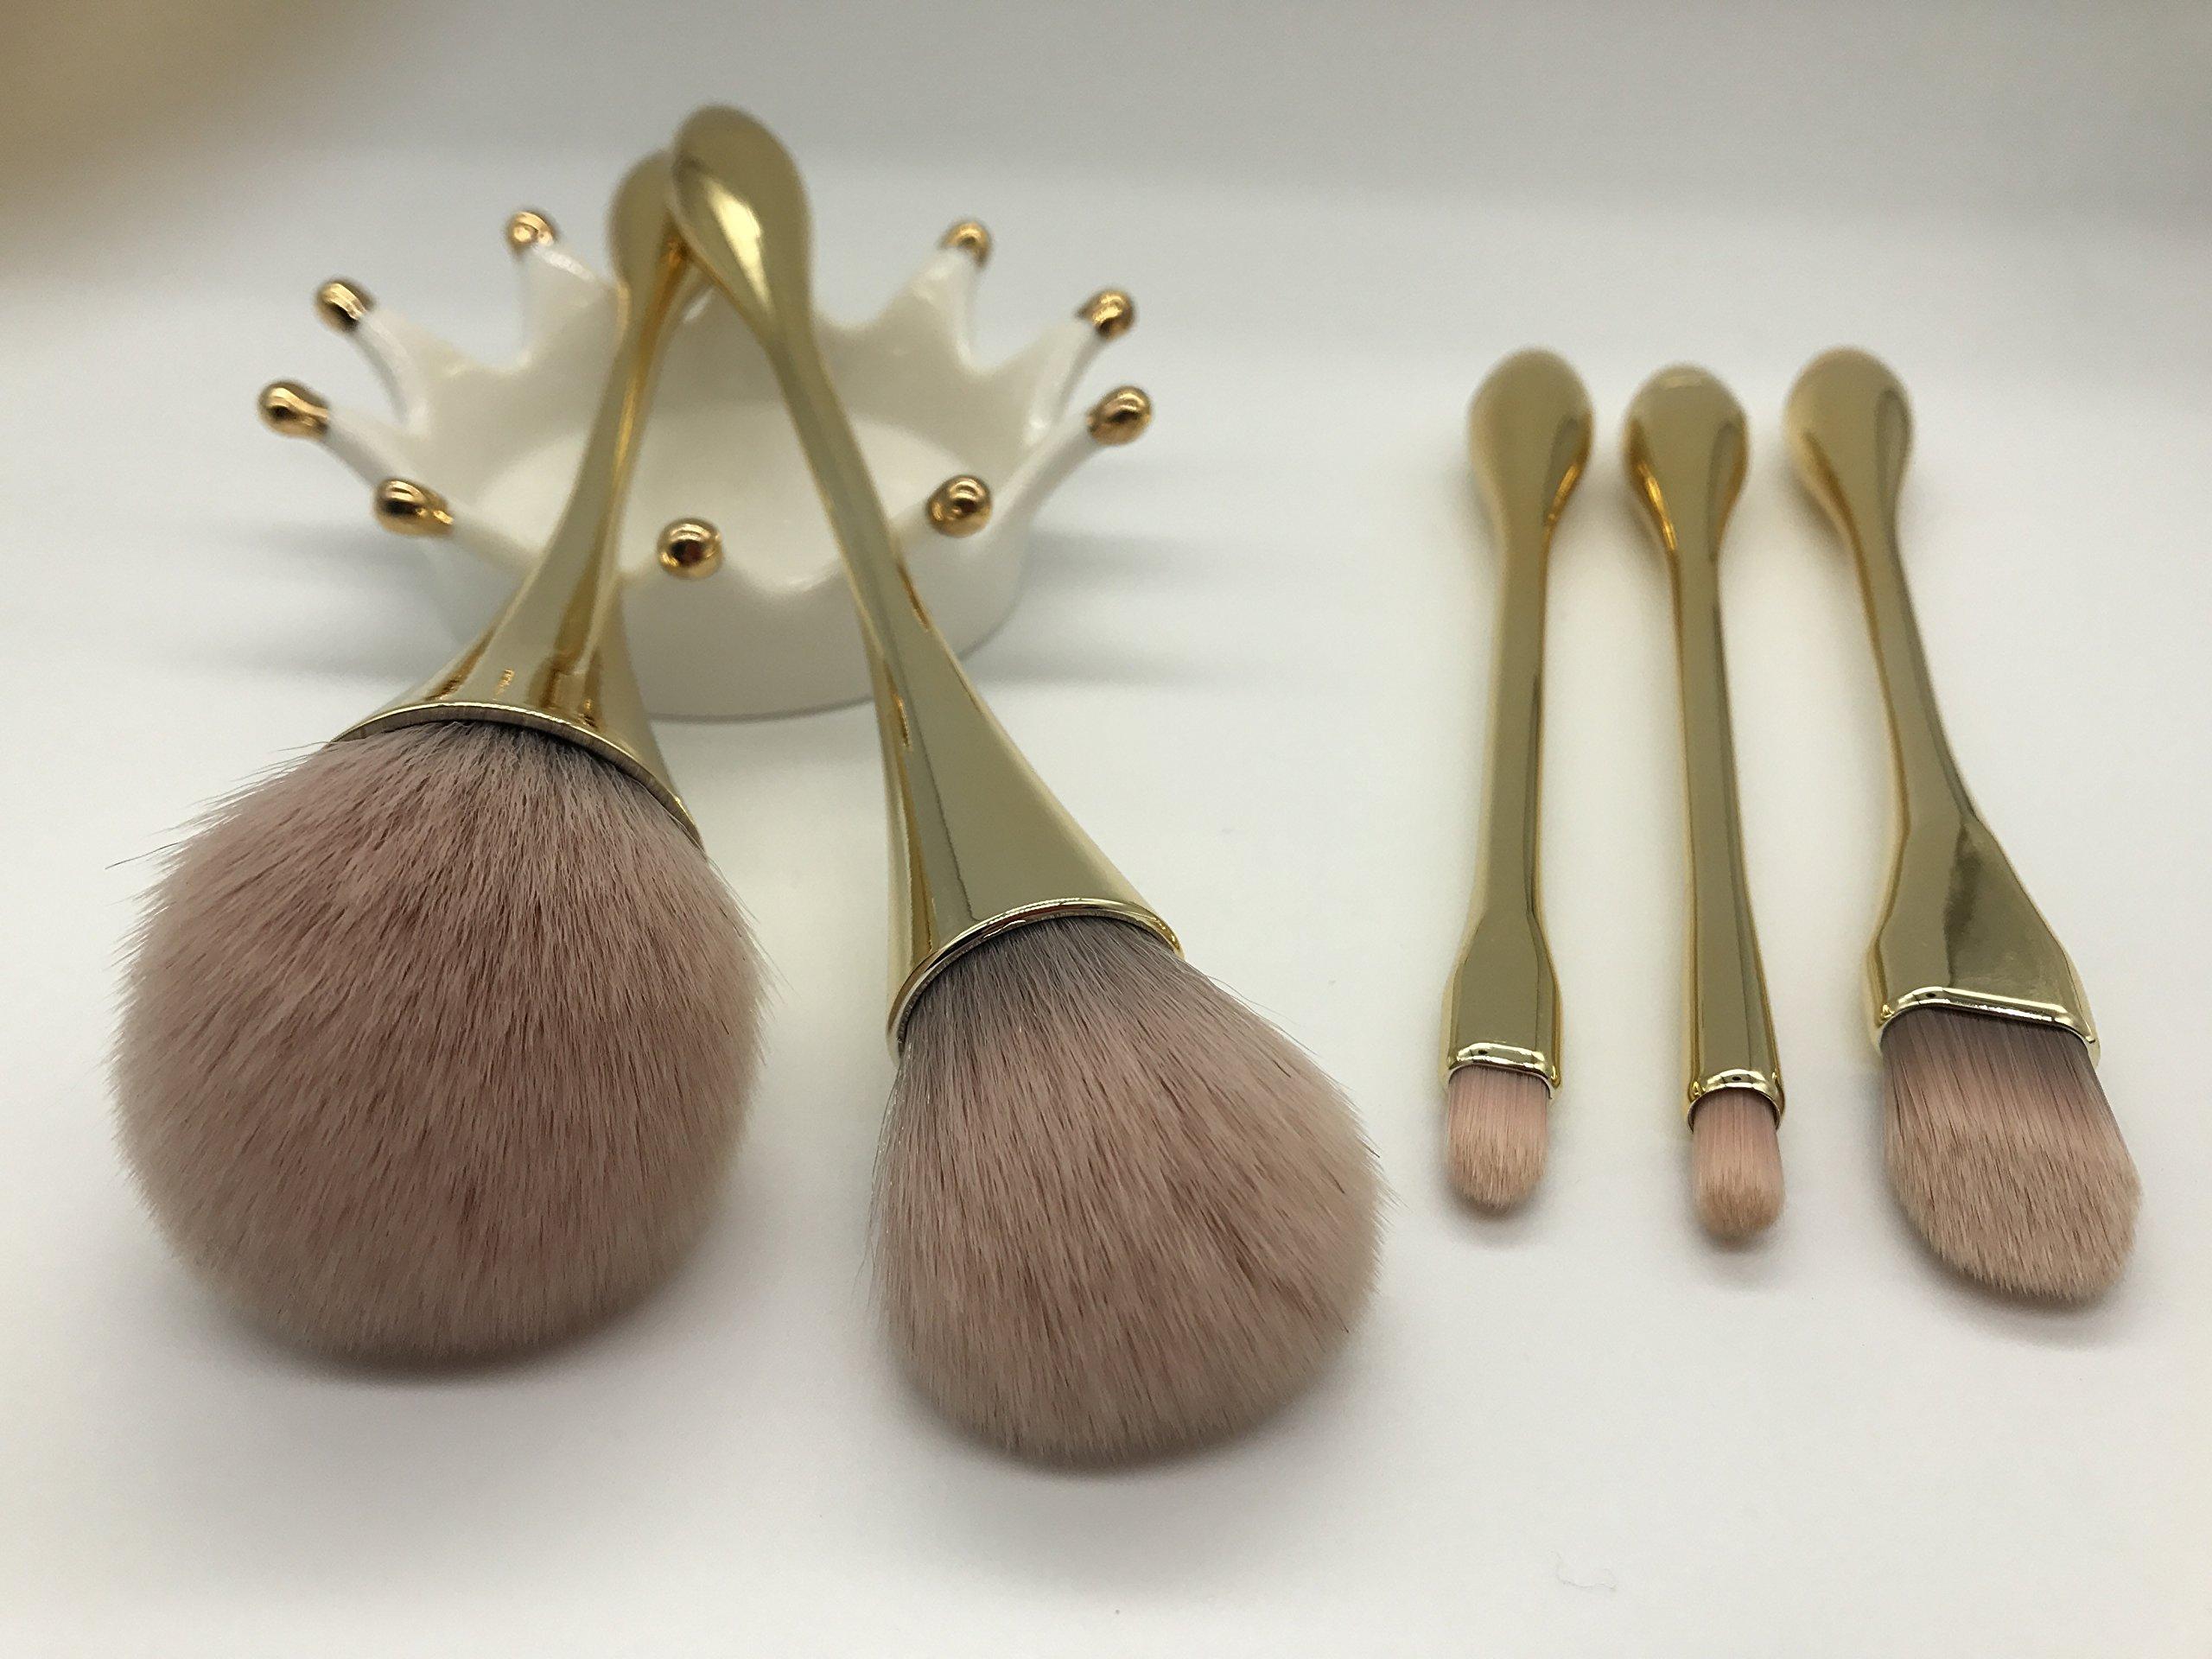 YoTruth 5 pcs Premium Comestic Brushes set Foundation Blending Blush Eyeliner Face Powder Brush Soft Comfortable Skin-friendly Gloden